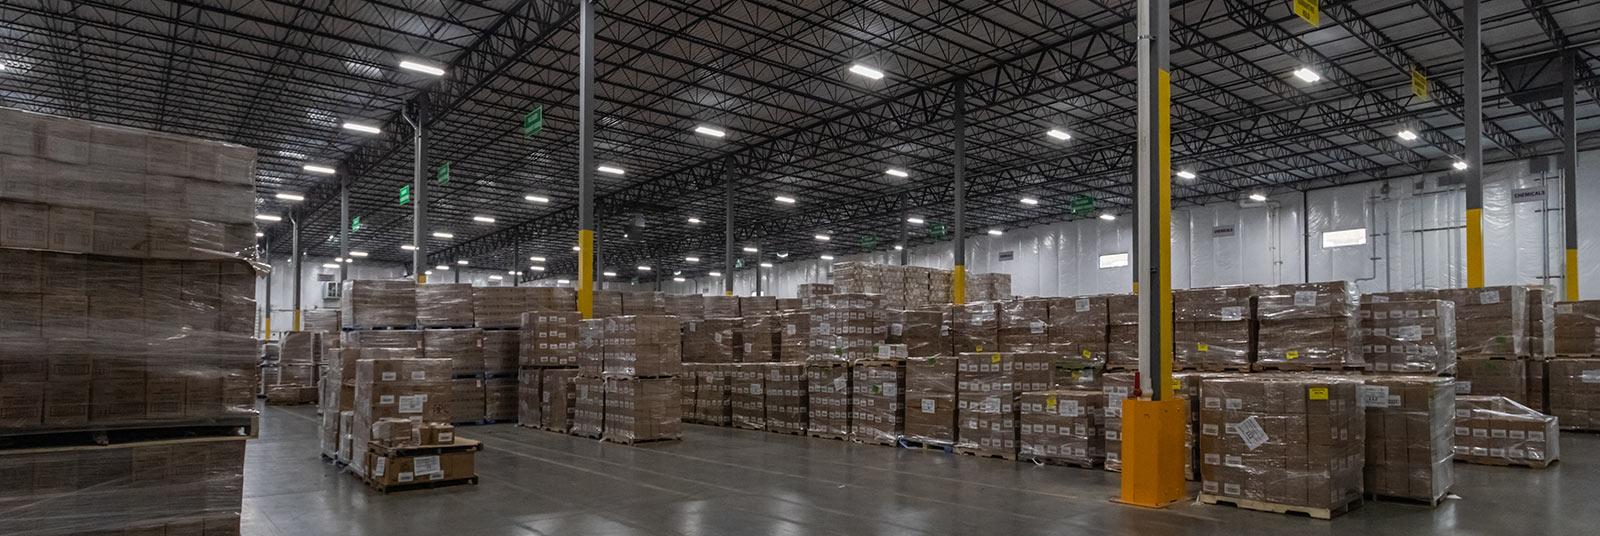 Large warehouse storage inside the Nehemiah Manufacturing facility in Cincinnati, Ohio.